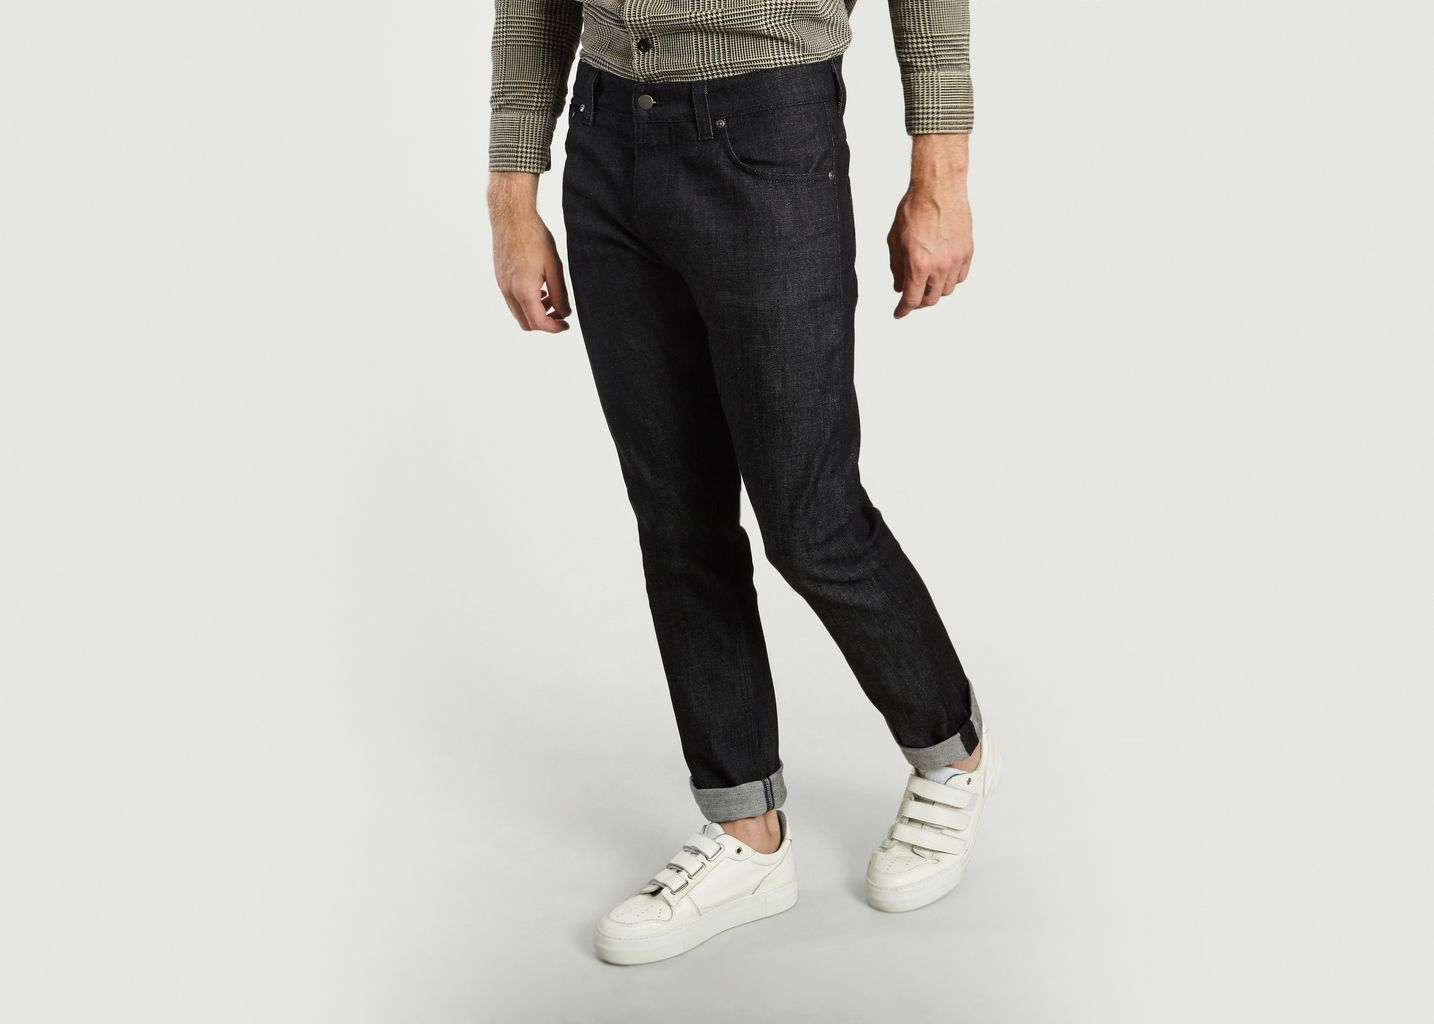 Jean Dude Dan Dry Comfort  - Nudie Jeans